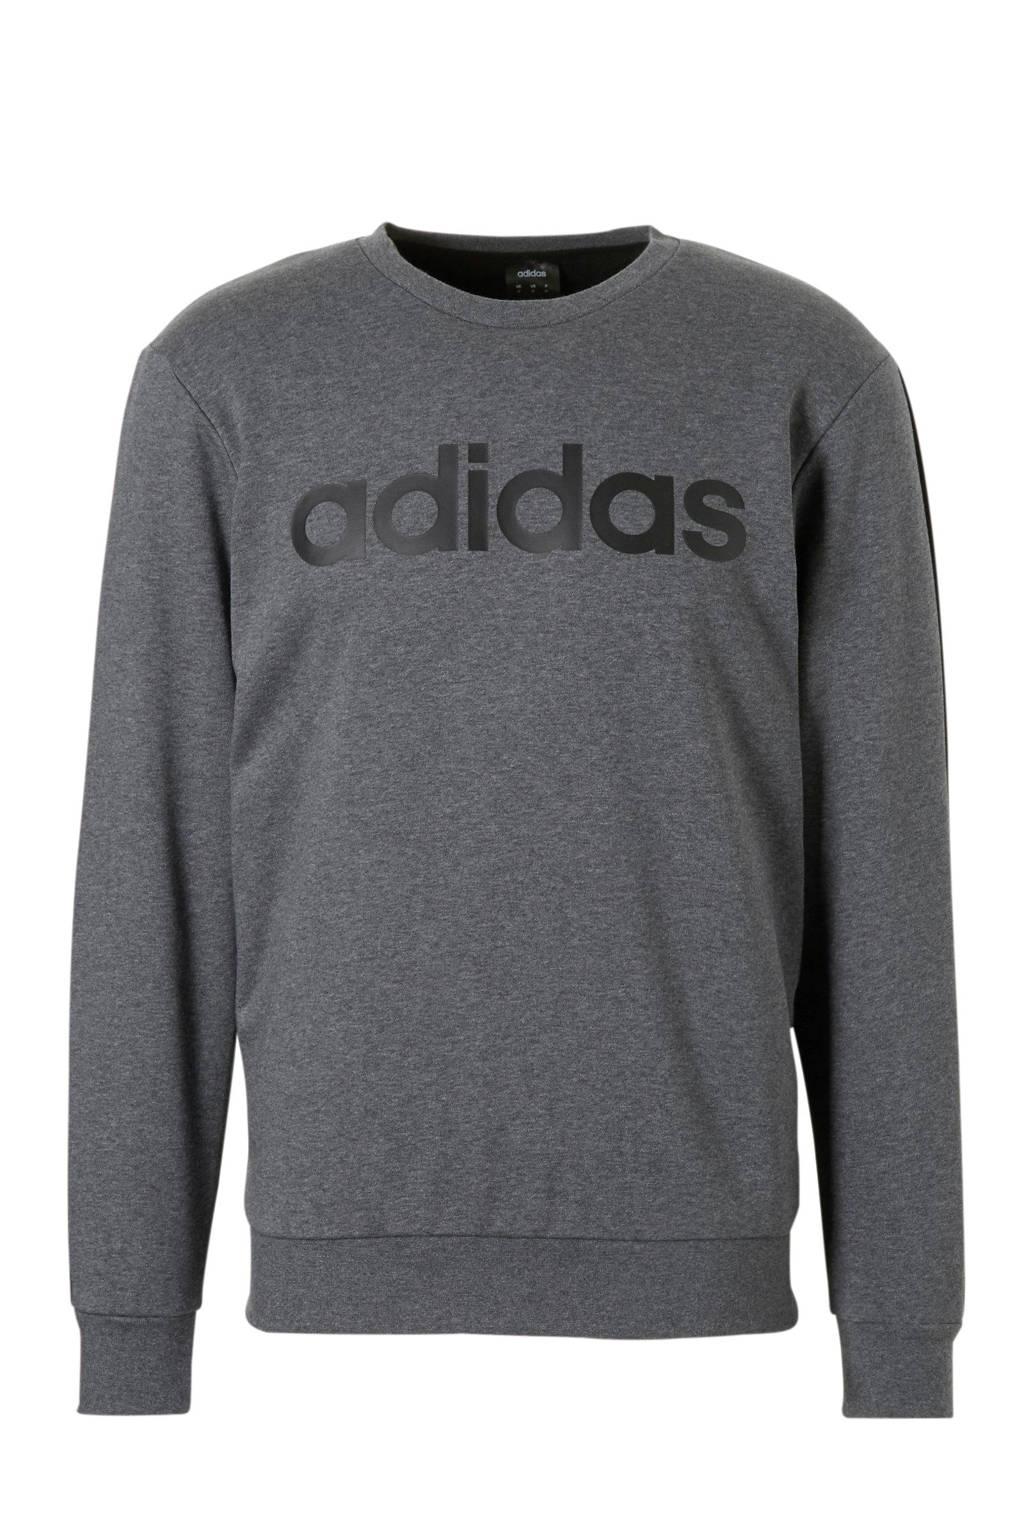 adidas performance   sportsweater grijs, Antraciet melange